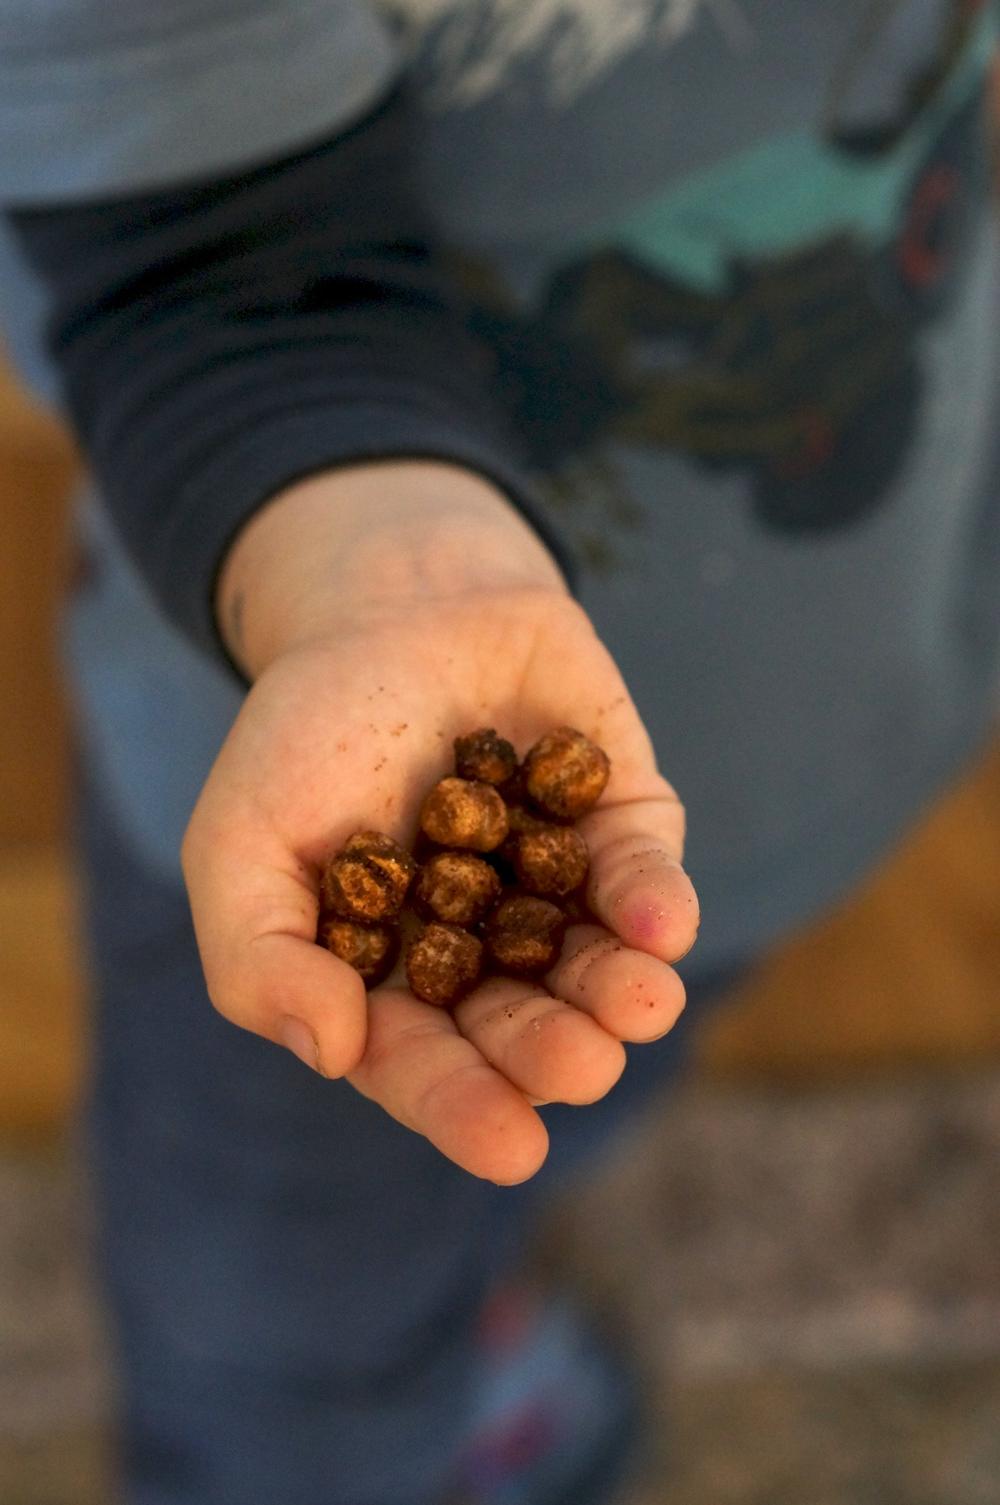 The Good Bean roasted chickpea snacks